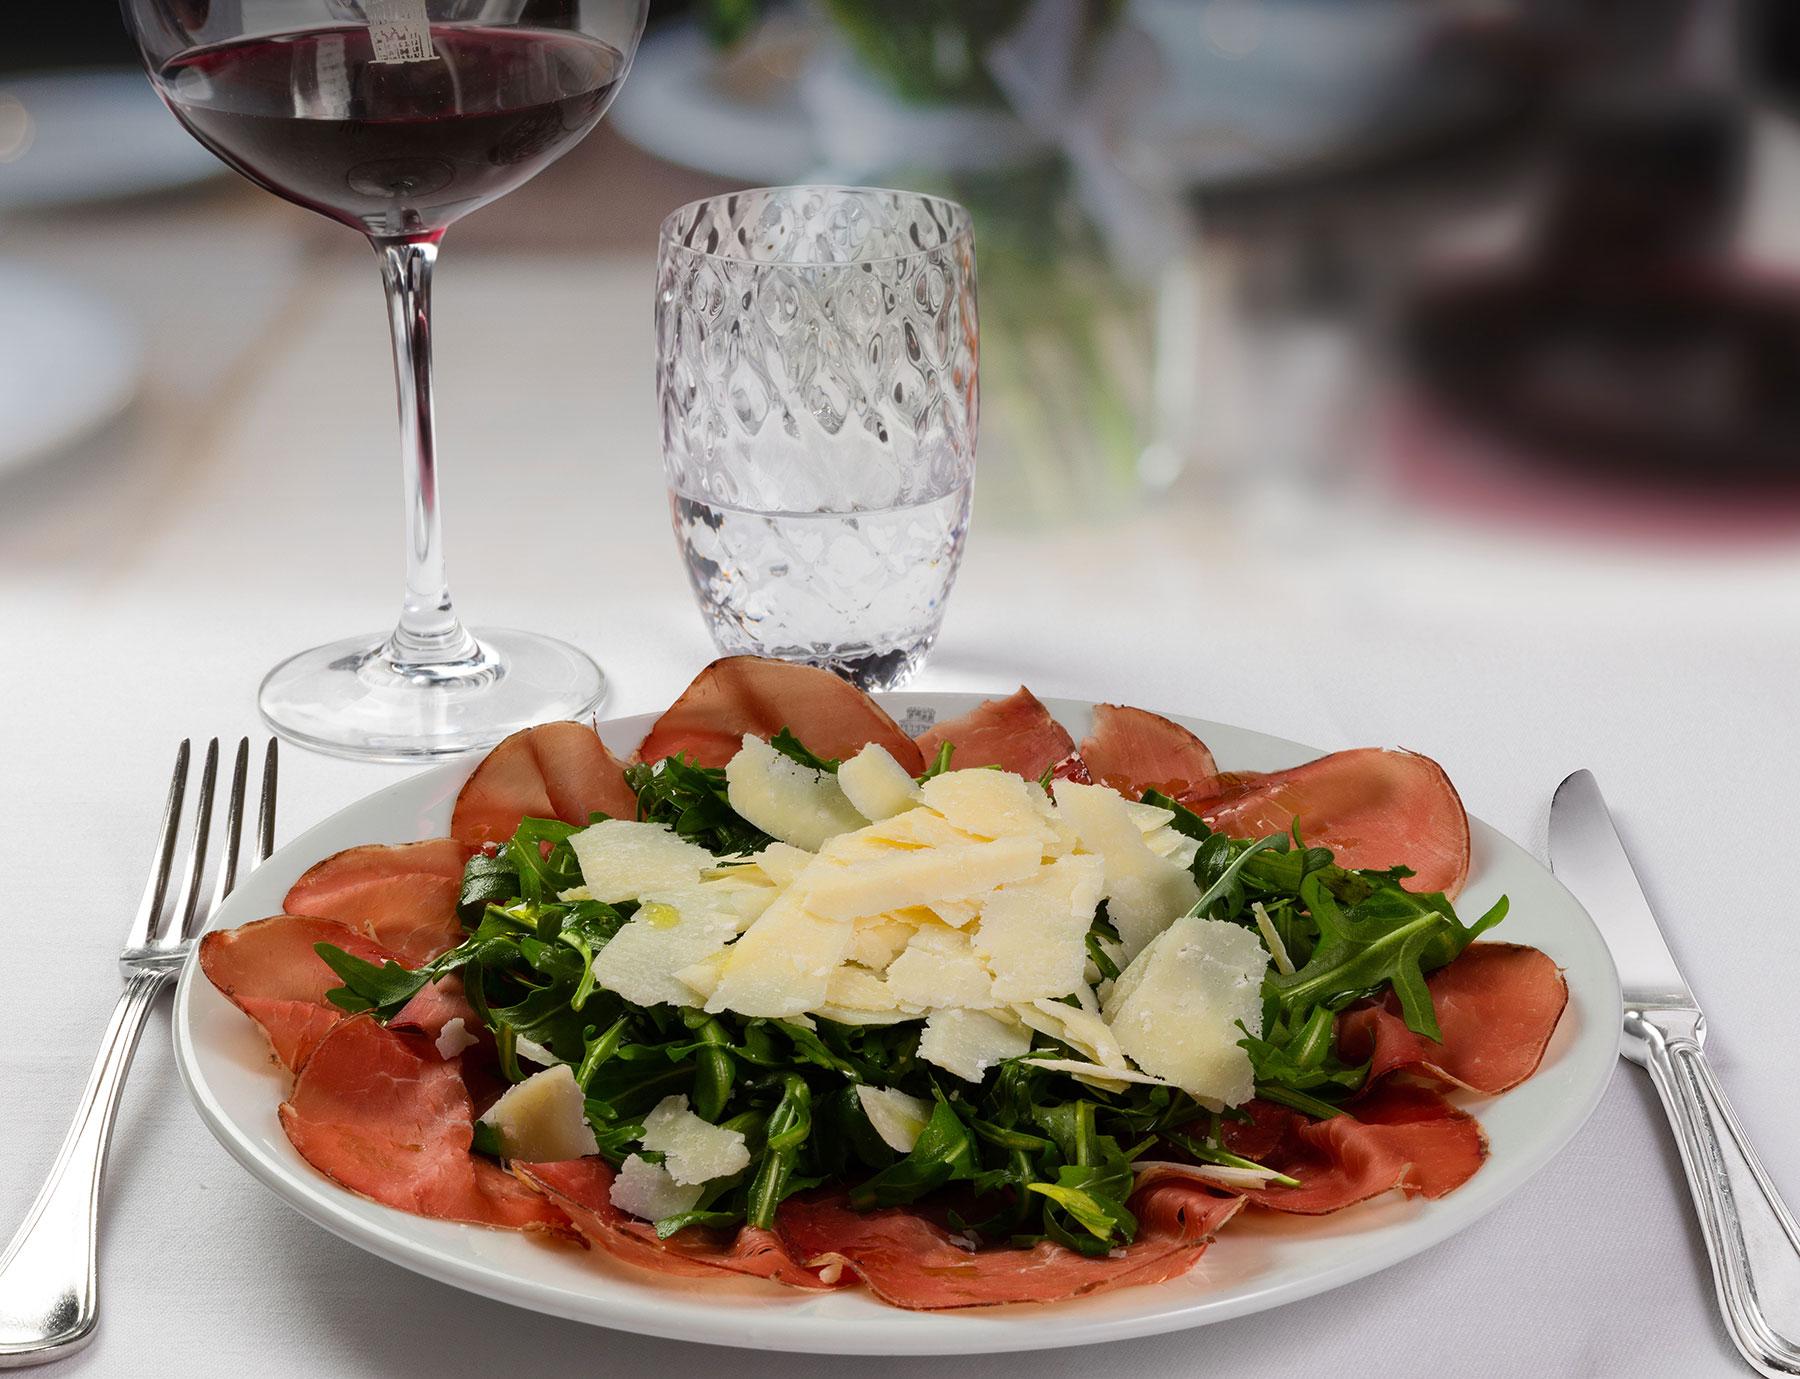 Bresaola con rucola e parmigiano